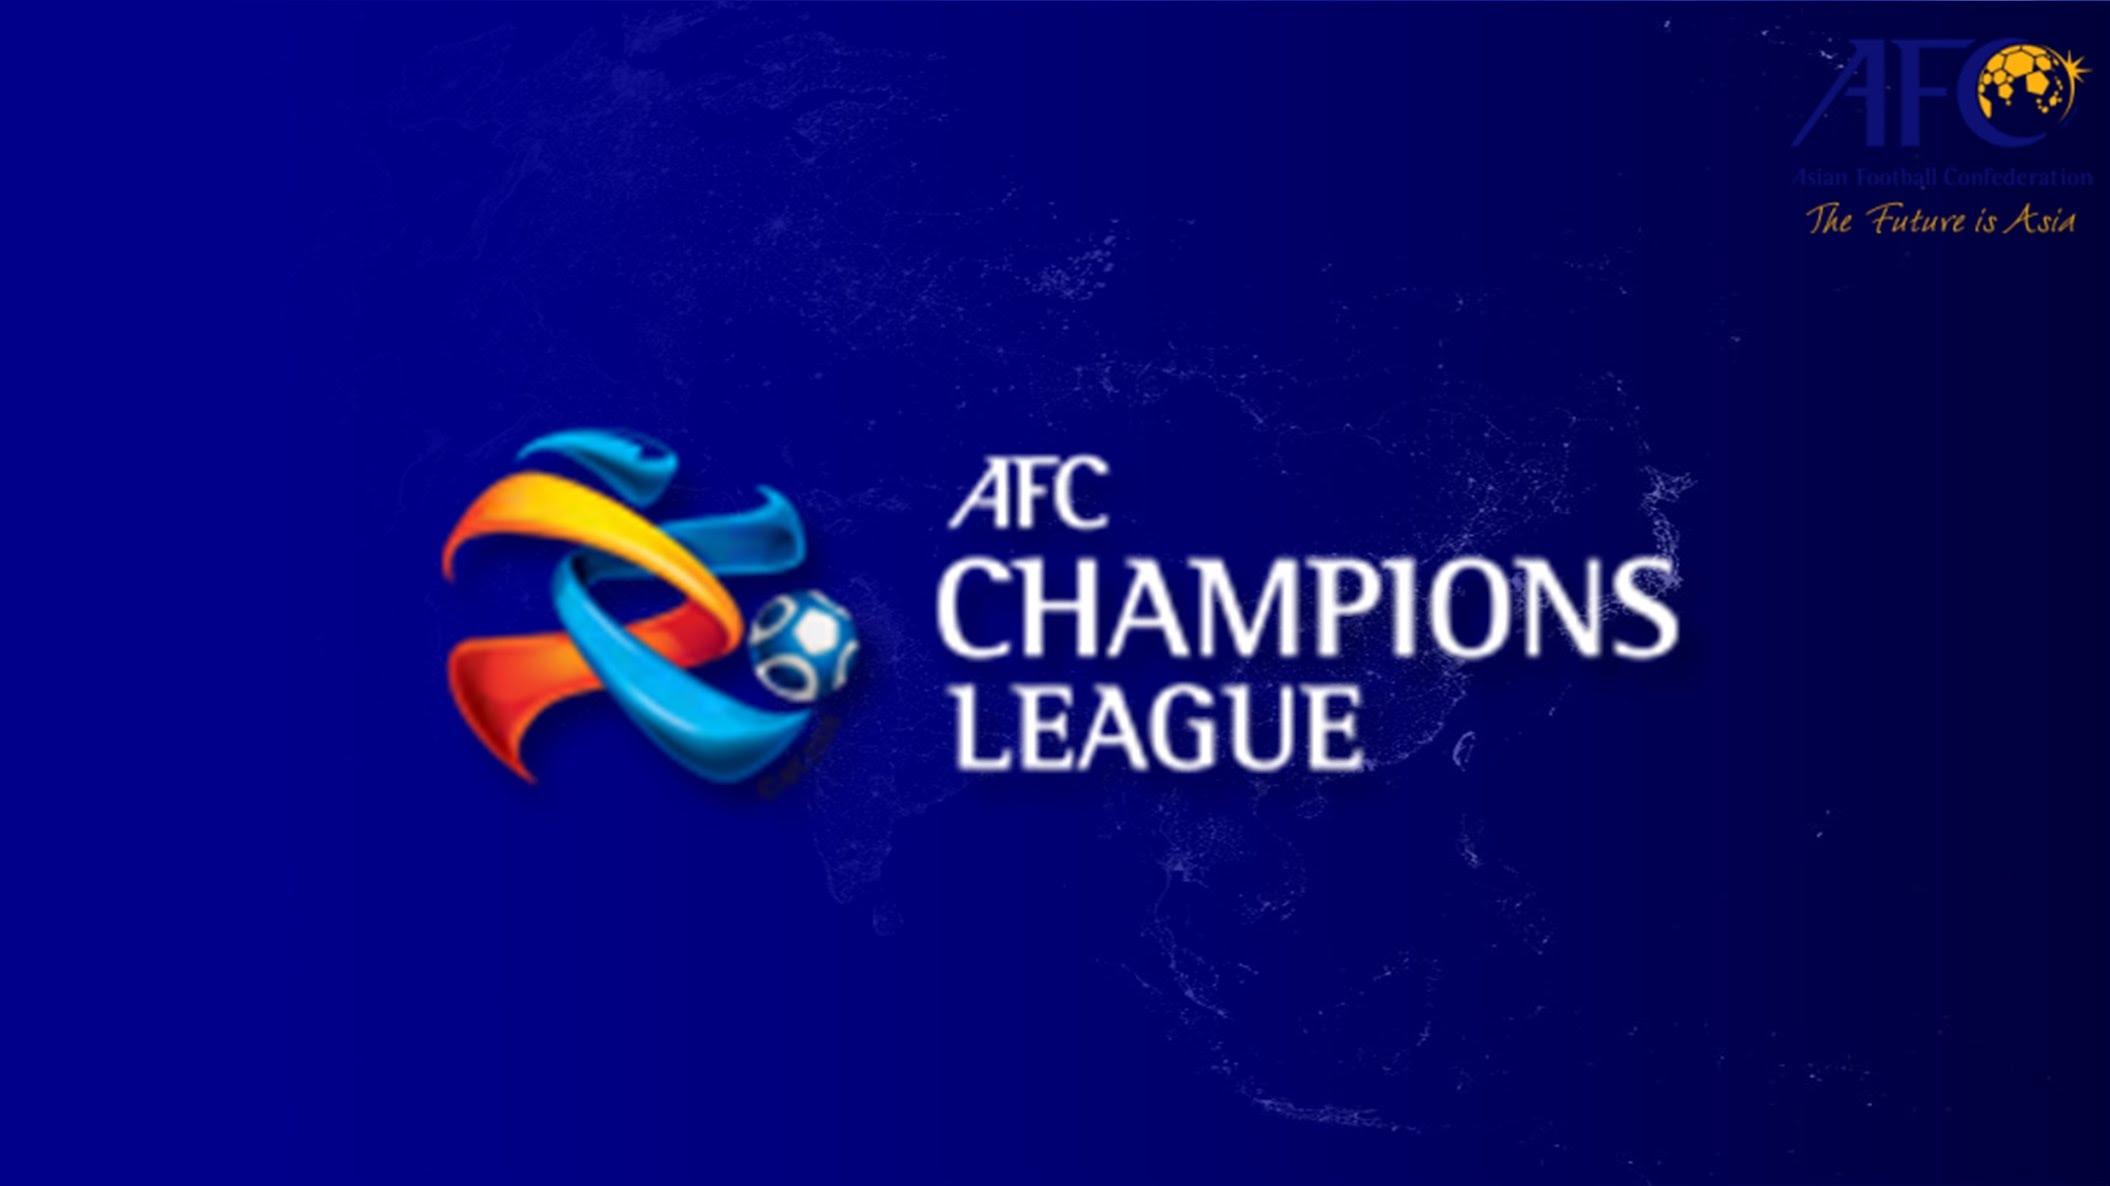 asian champions league - photo #19